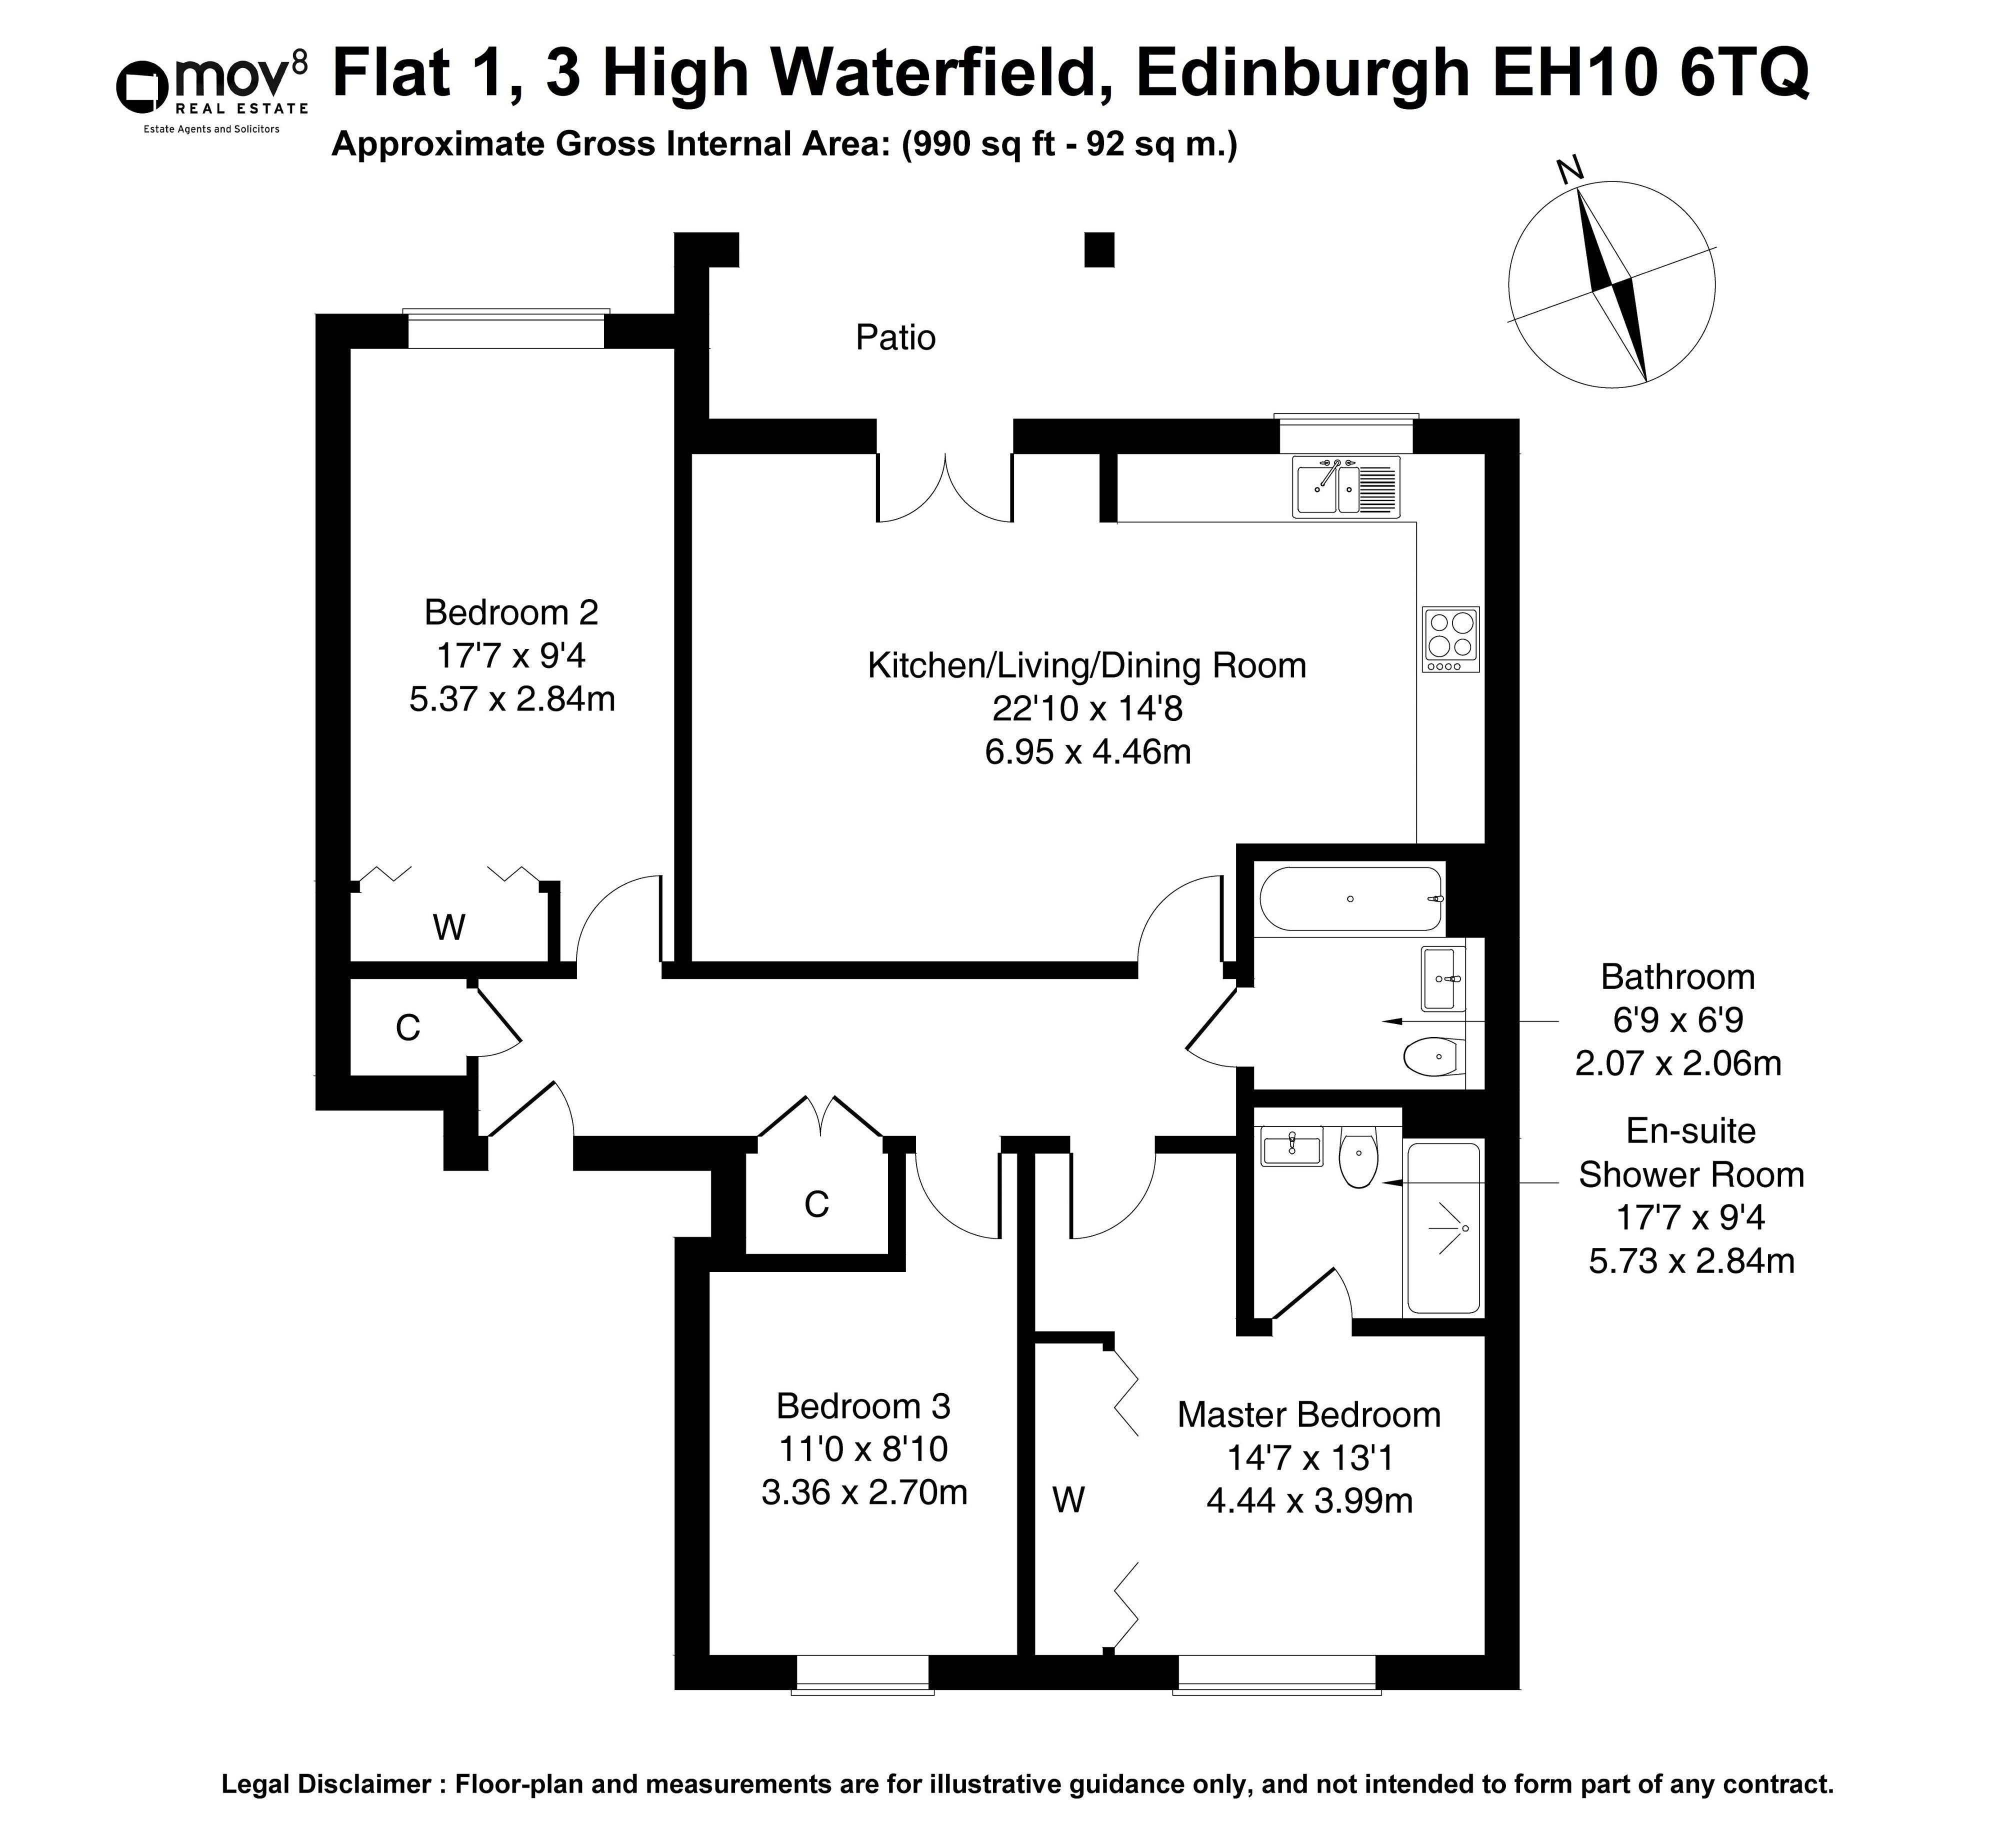 Floorplan 1 of Flat 1, 3 High Waterfield, Fairmilehead, Edinburgh, EH10 6TQ